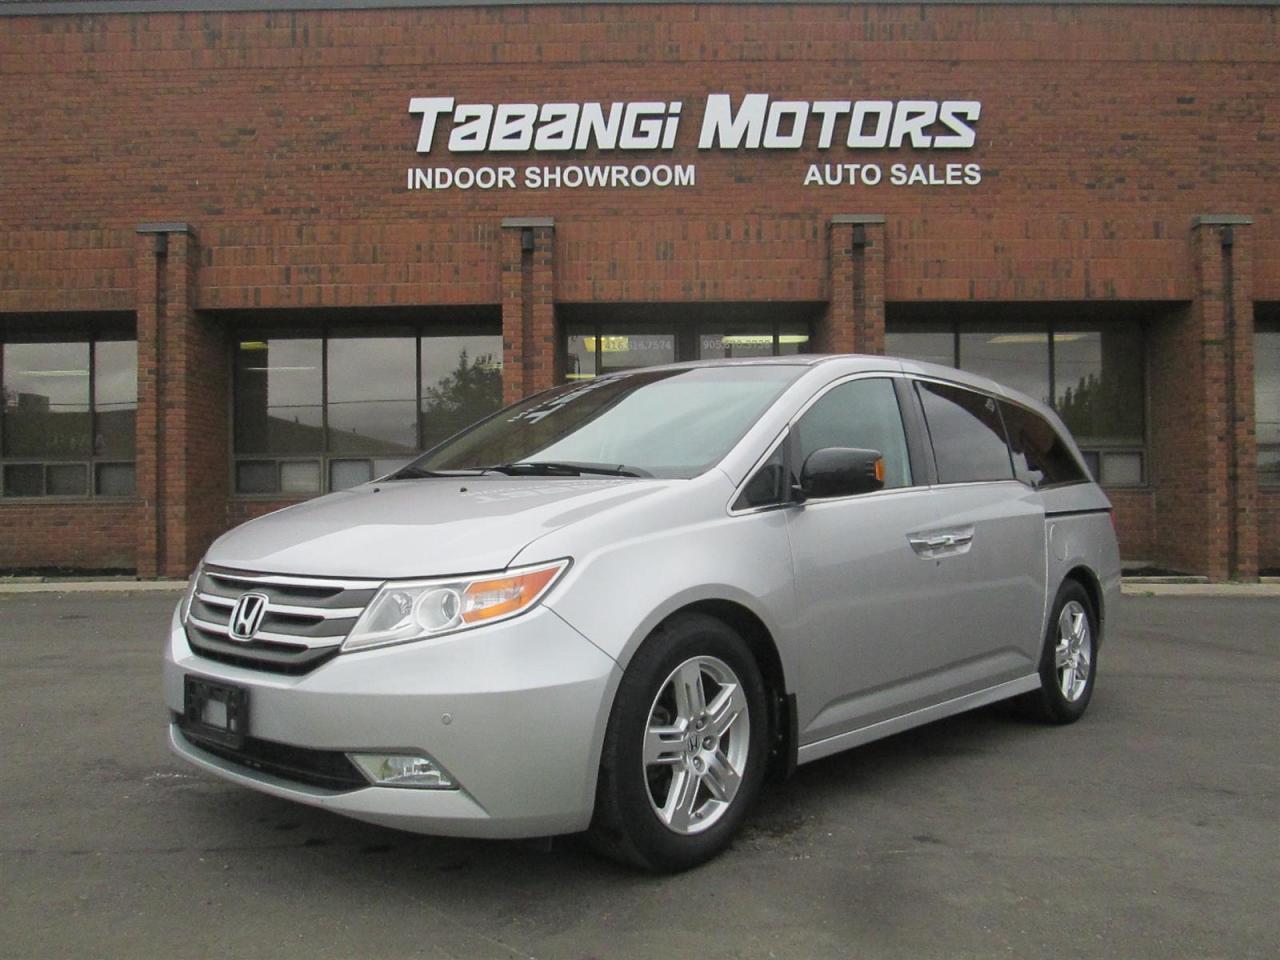 Photo of Silver 2012 Honda Odyssey